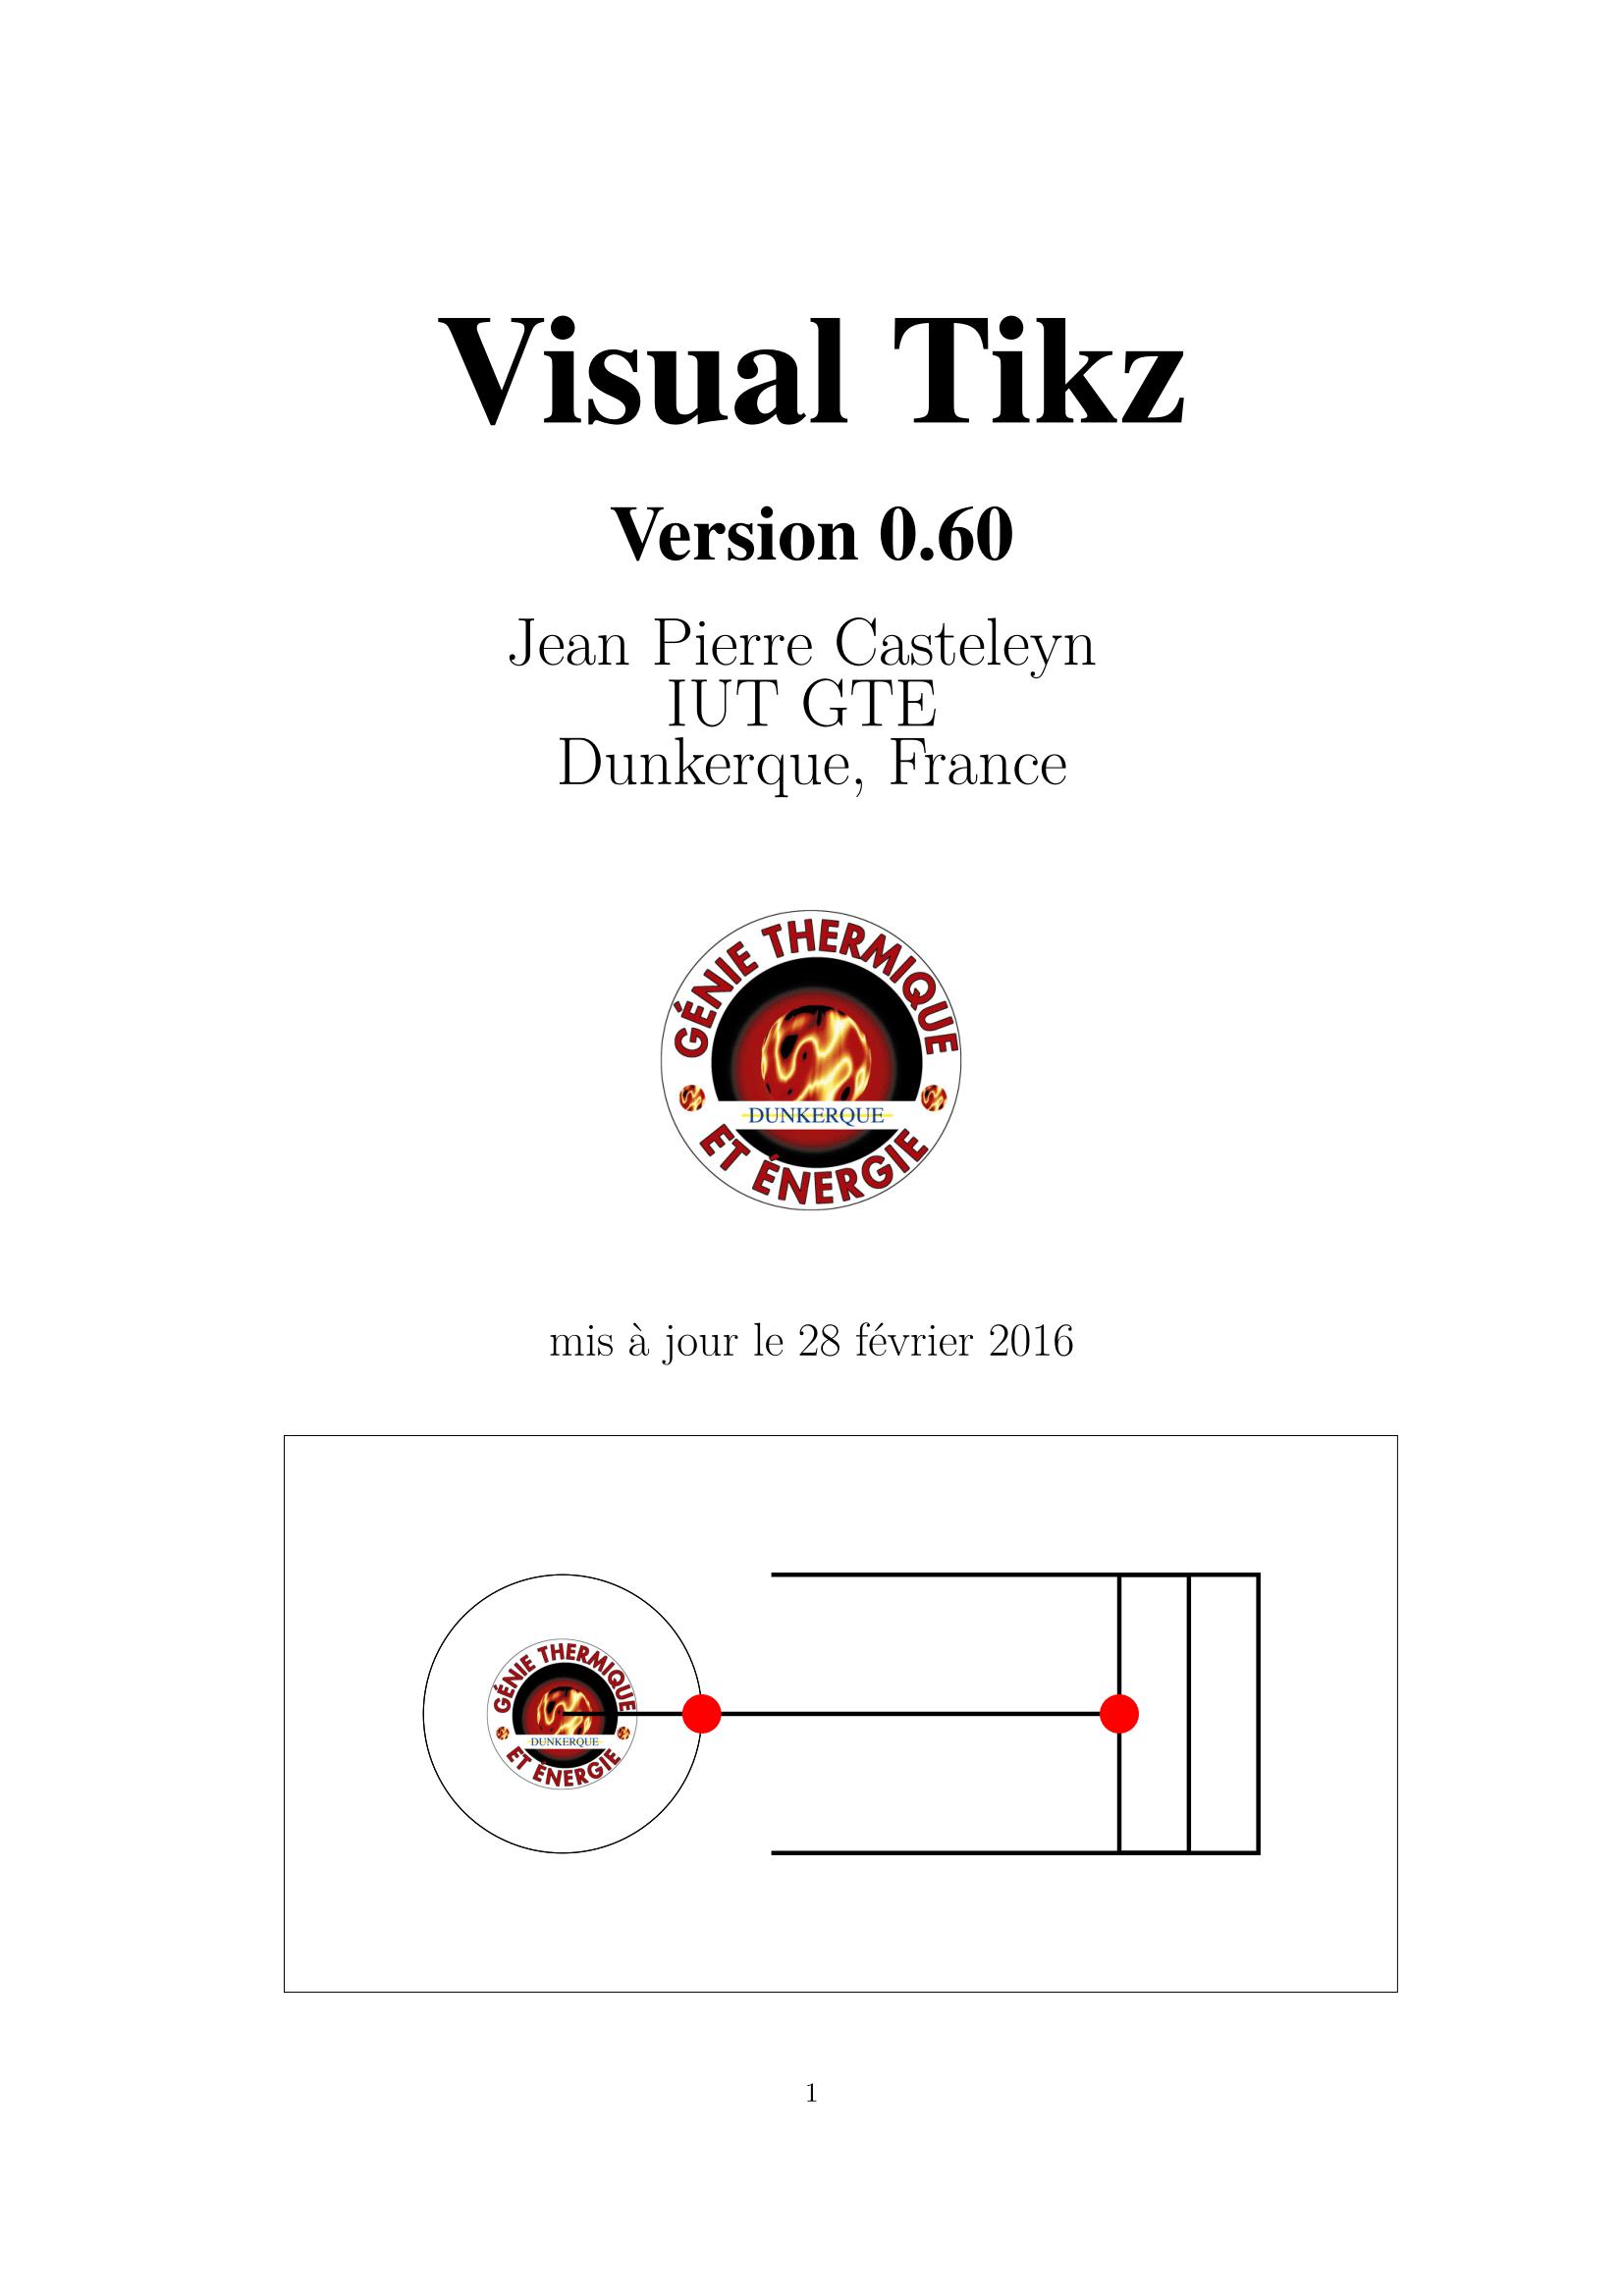 VisualTIKZ-fr-001